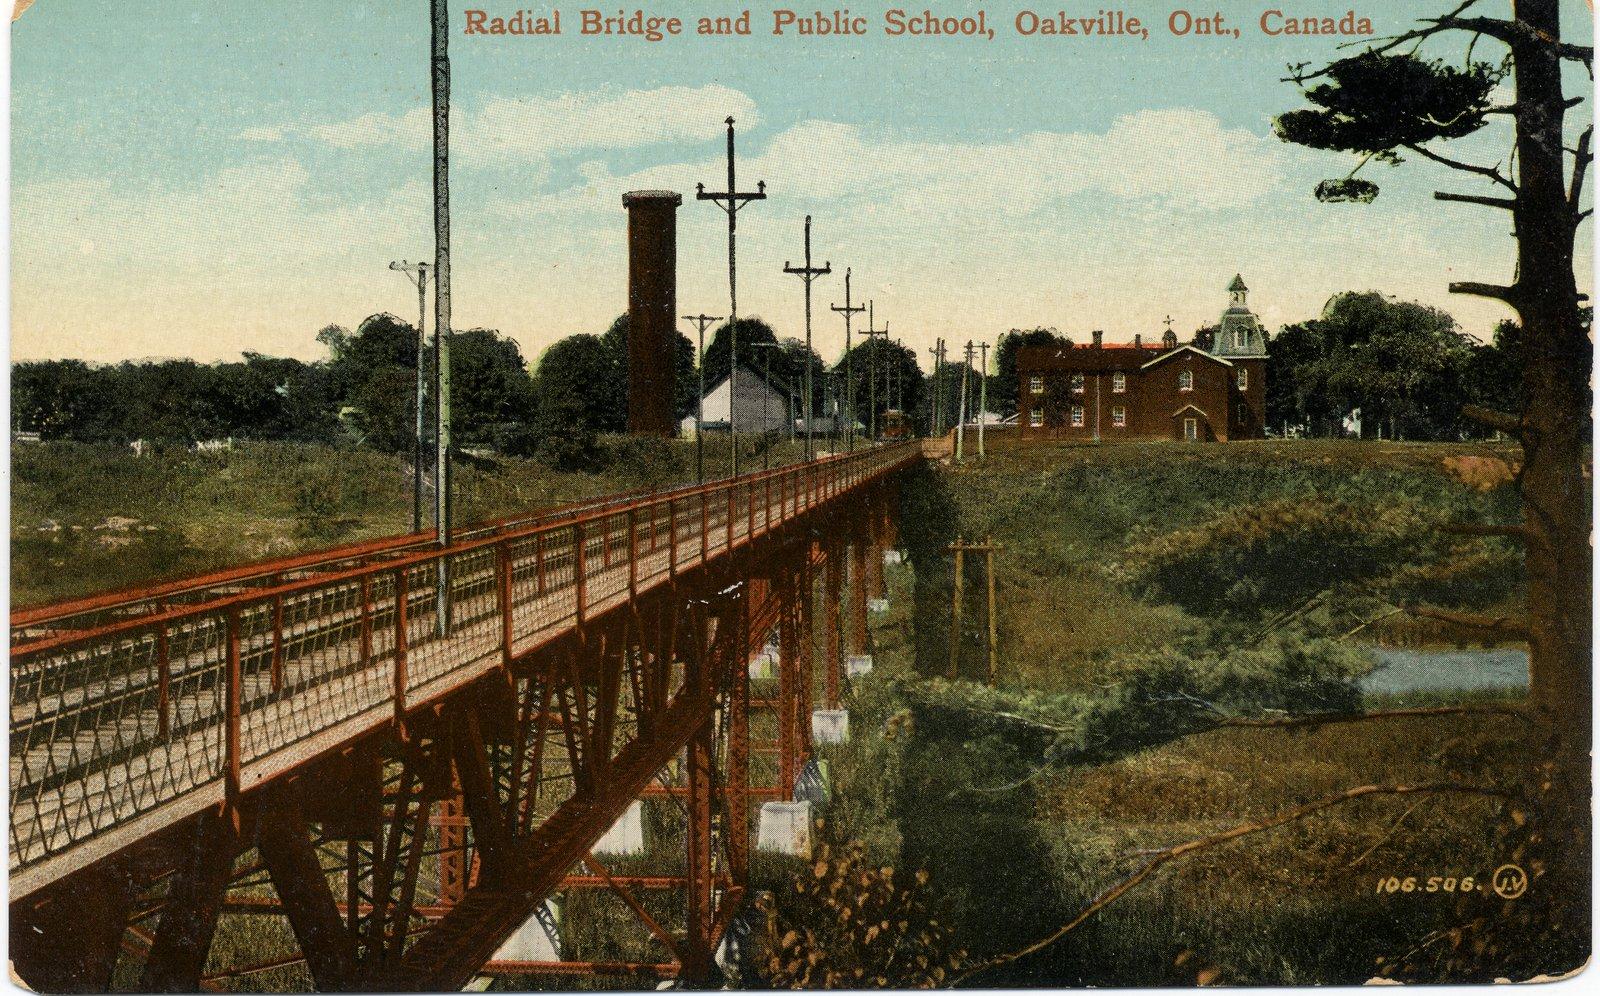 Postcard: Radial Bridge and Public School, Oakville, Ont., Canada